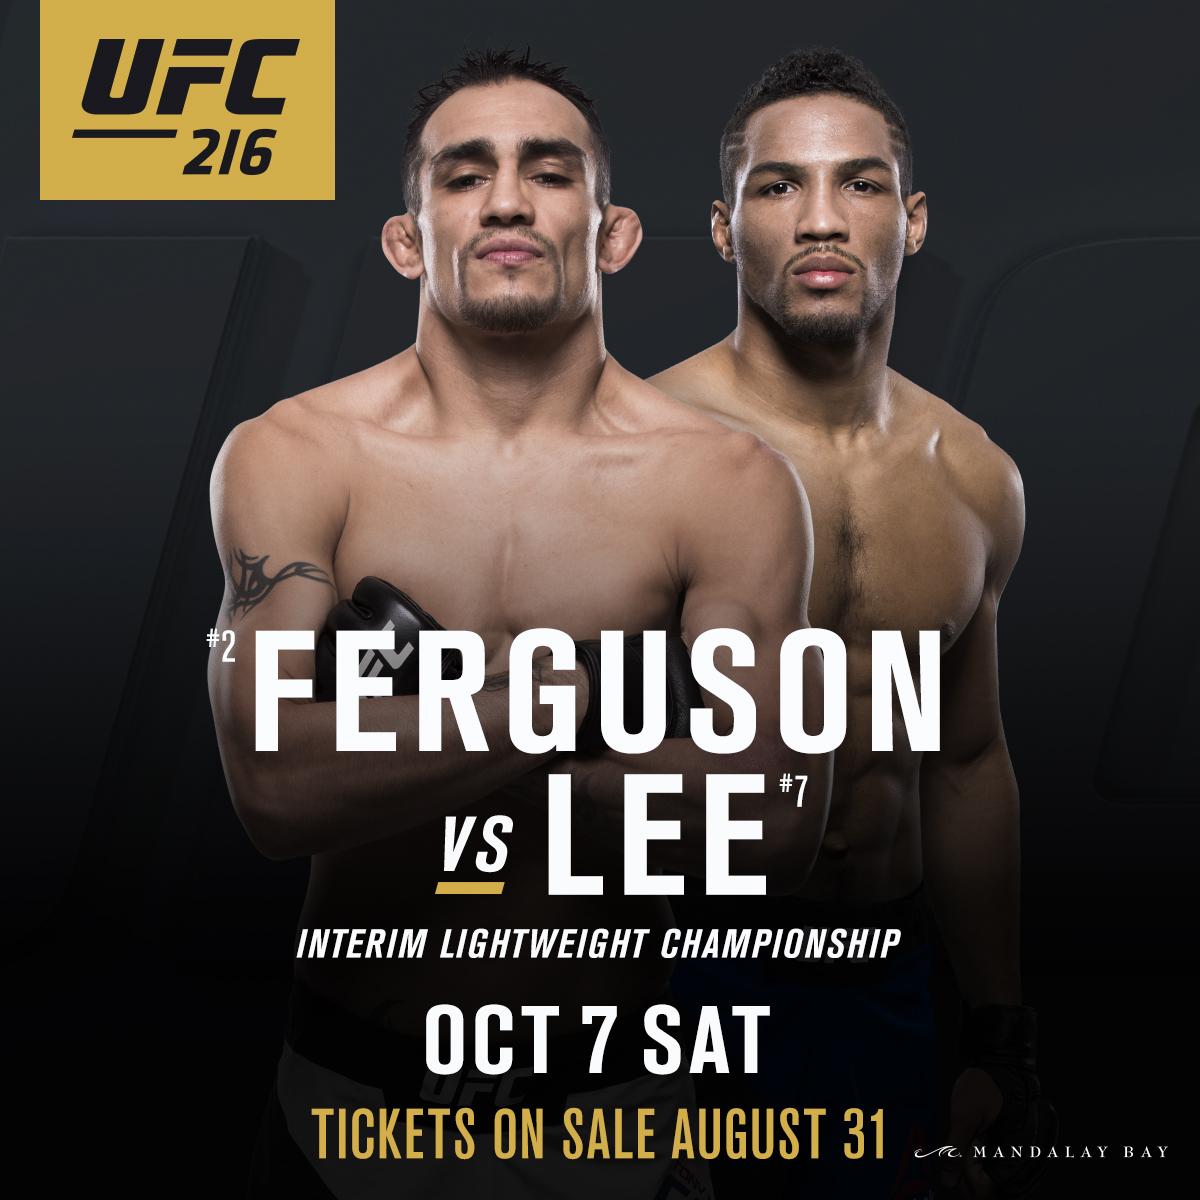 Fightful MMA